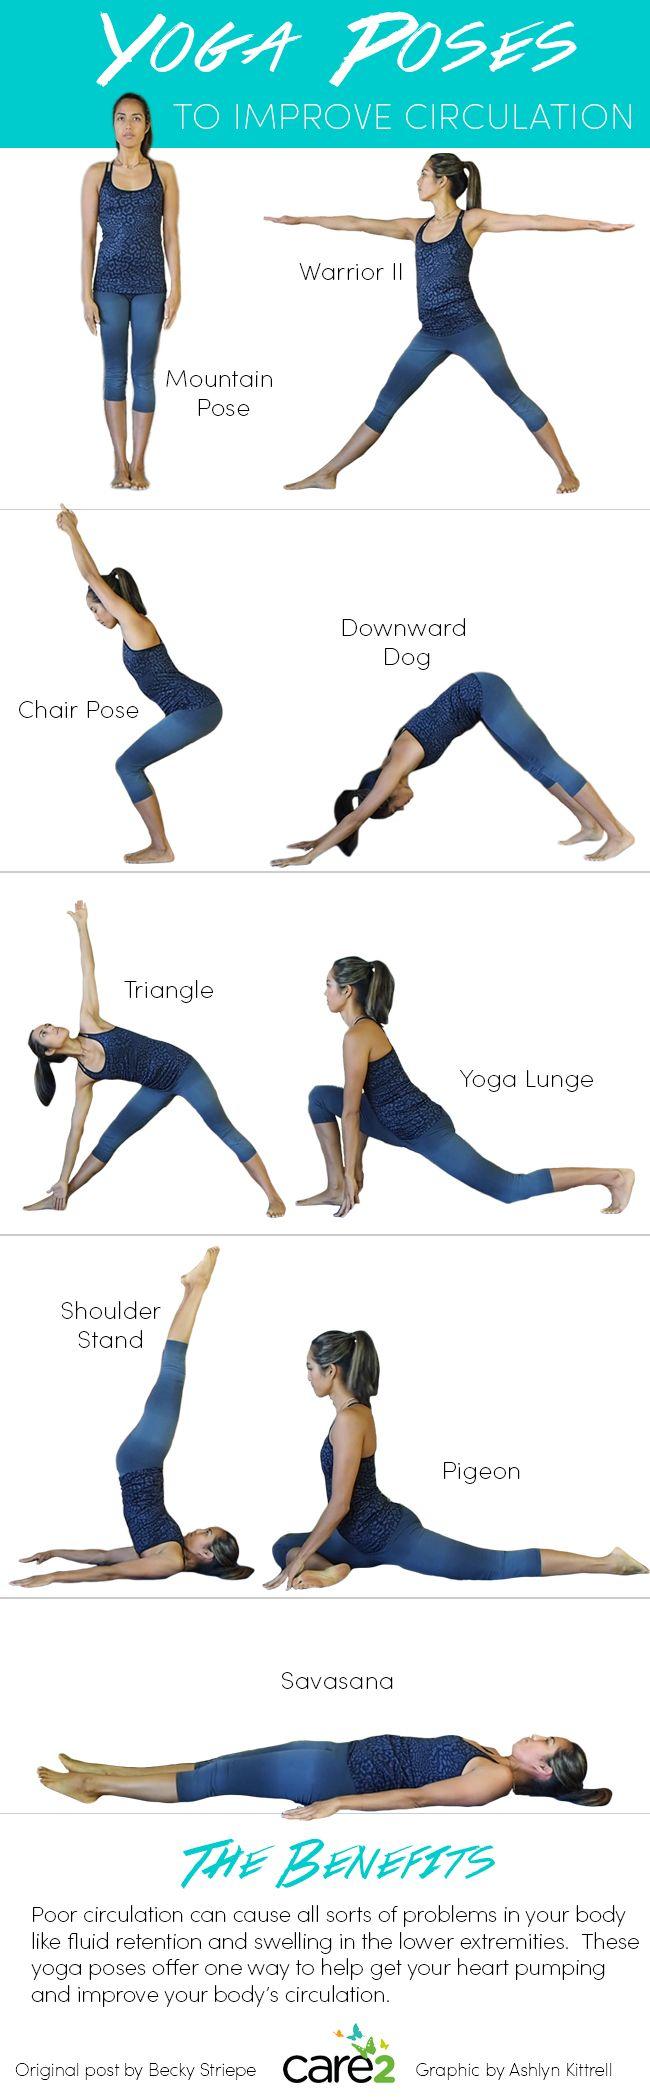 Yoga Poses to Improve Circulation  Yoga postures, Yoga benefits